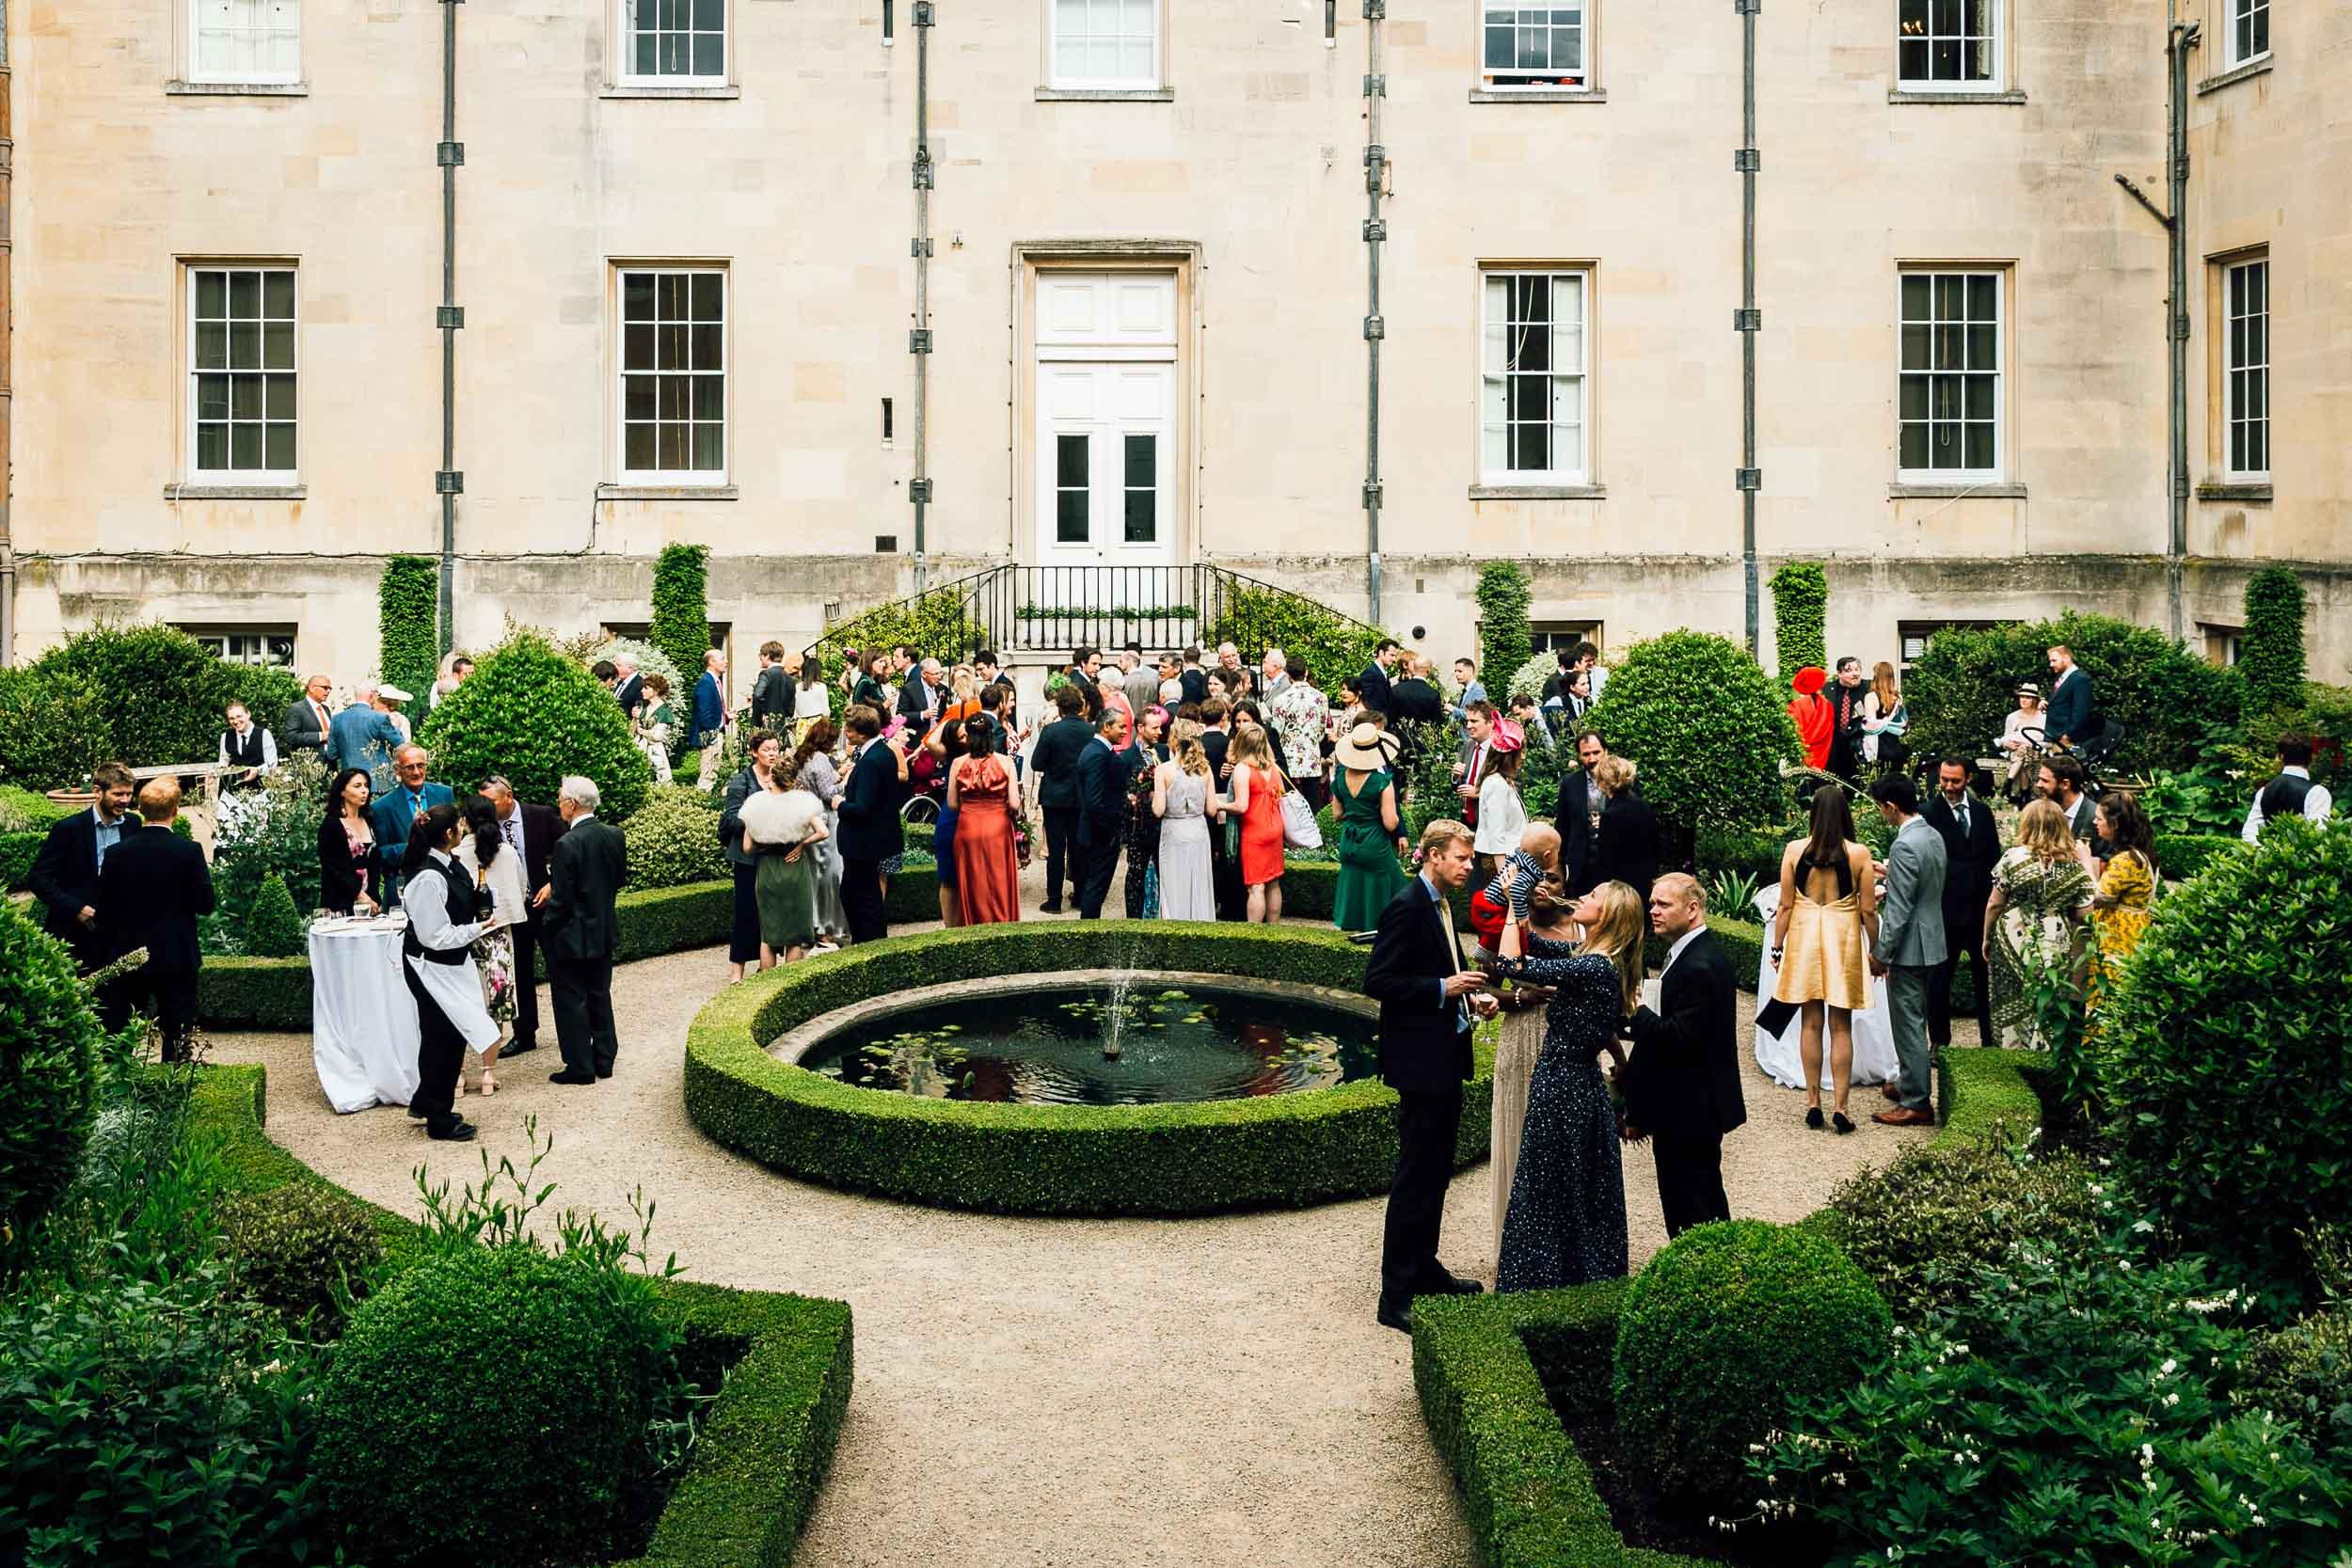 syon-house-wedding-photographer-london 084.jpg